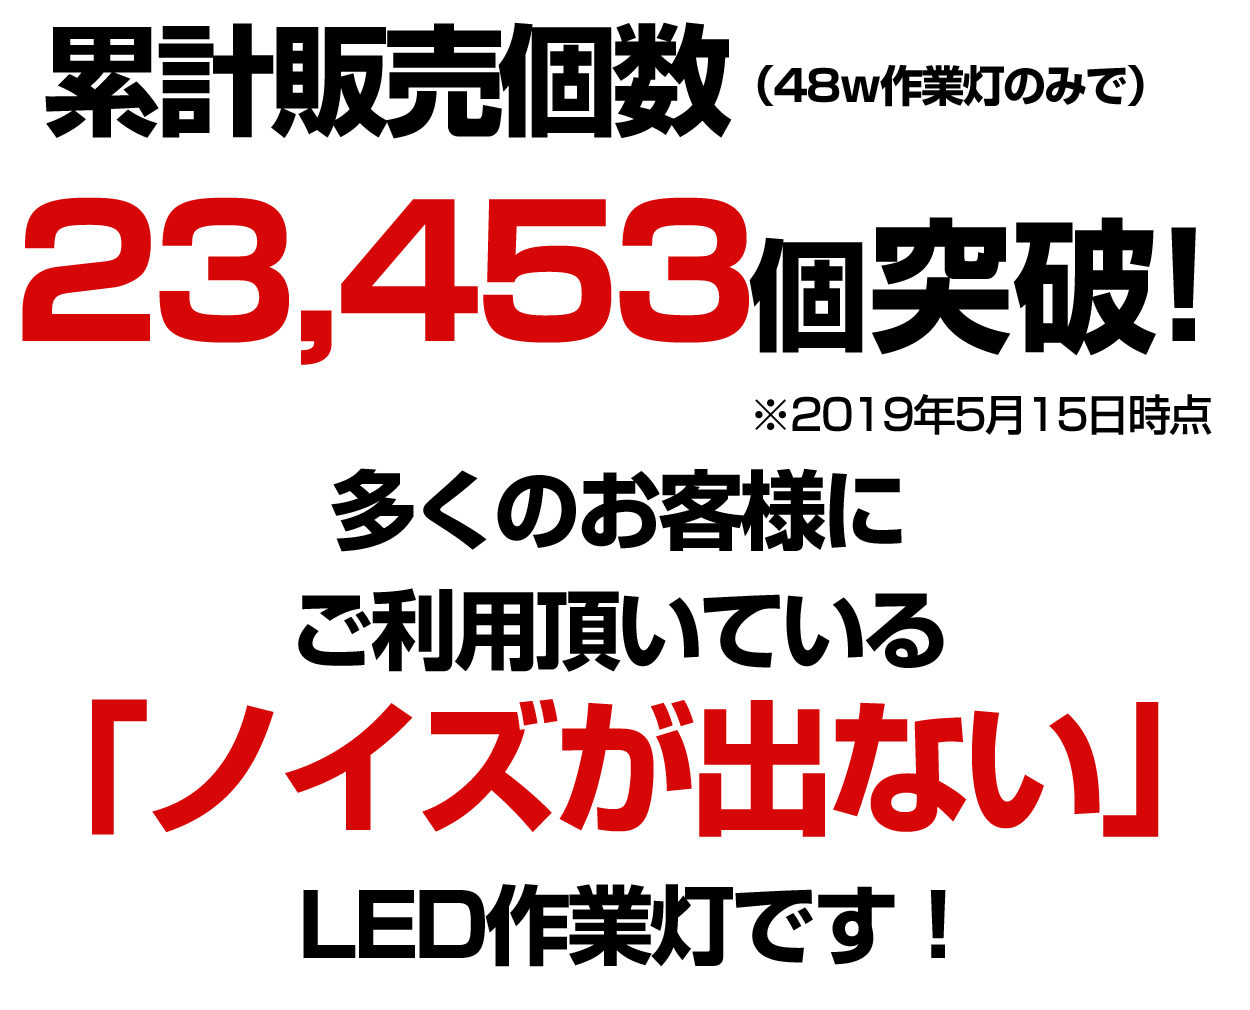 LED作業灯48W 累計販売個数紹介